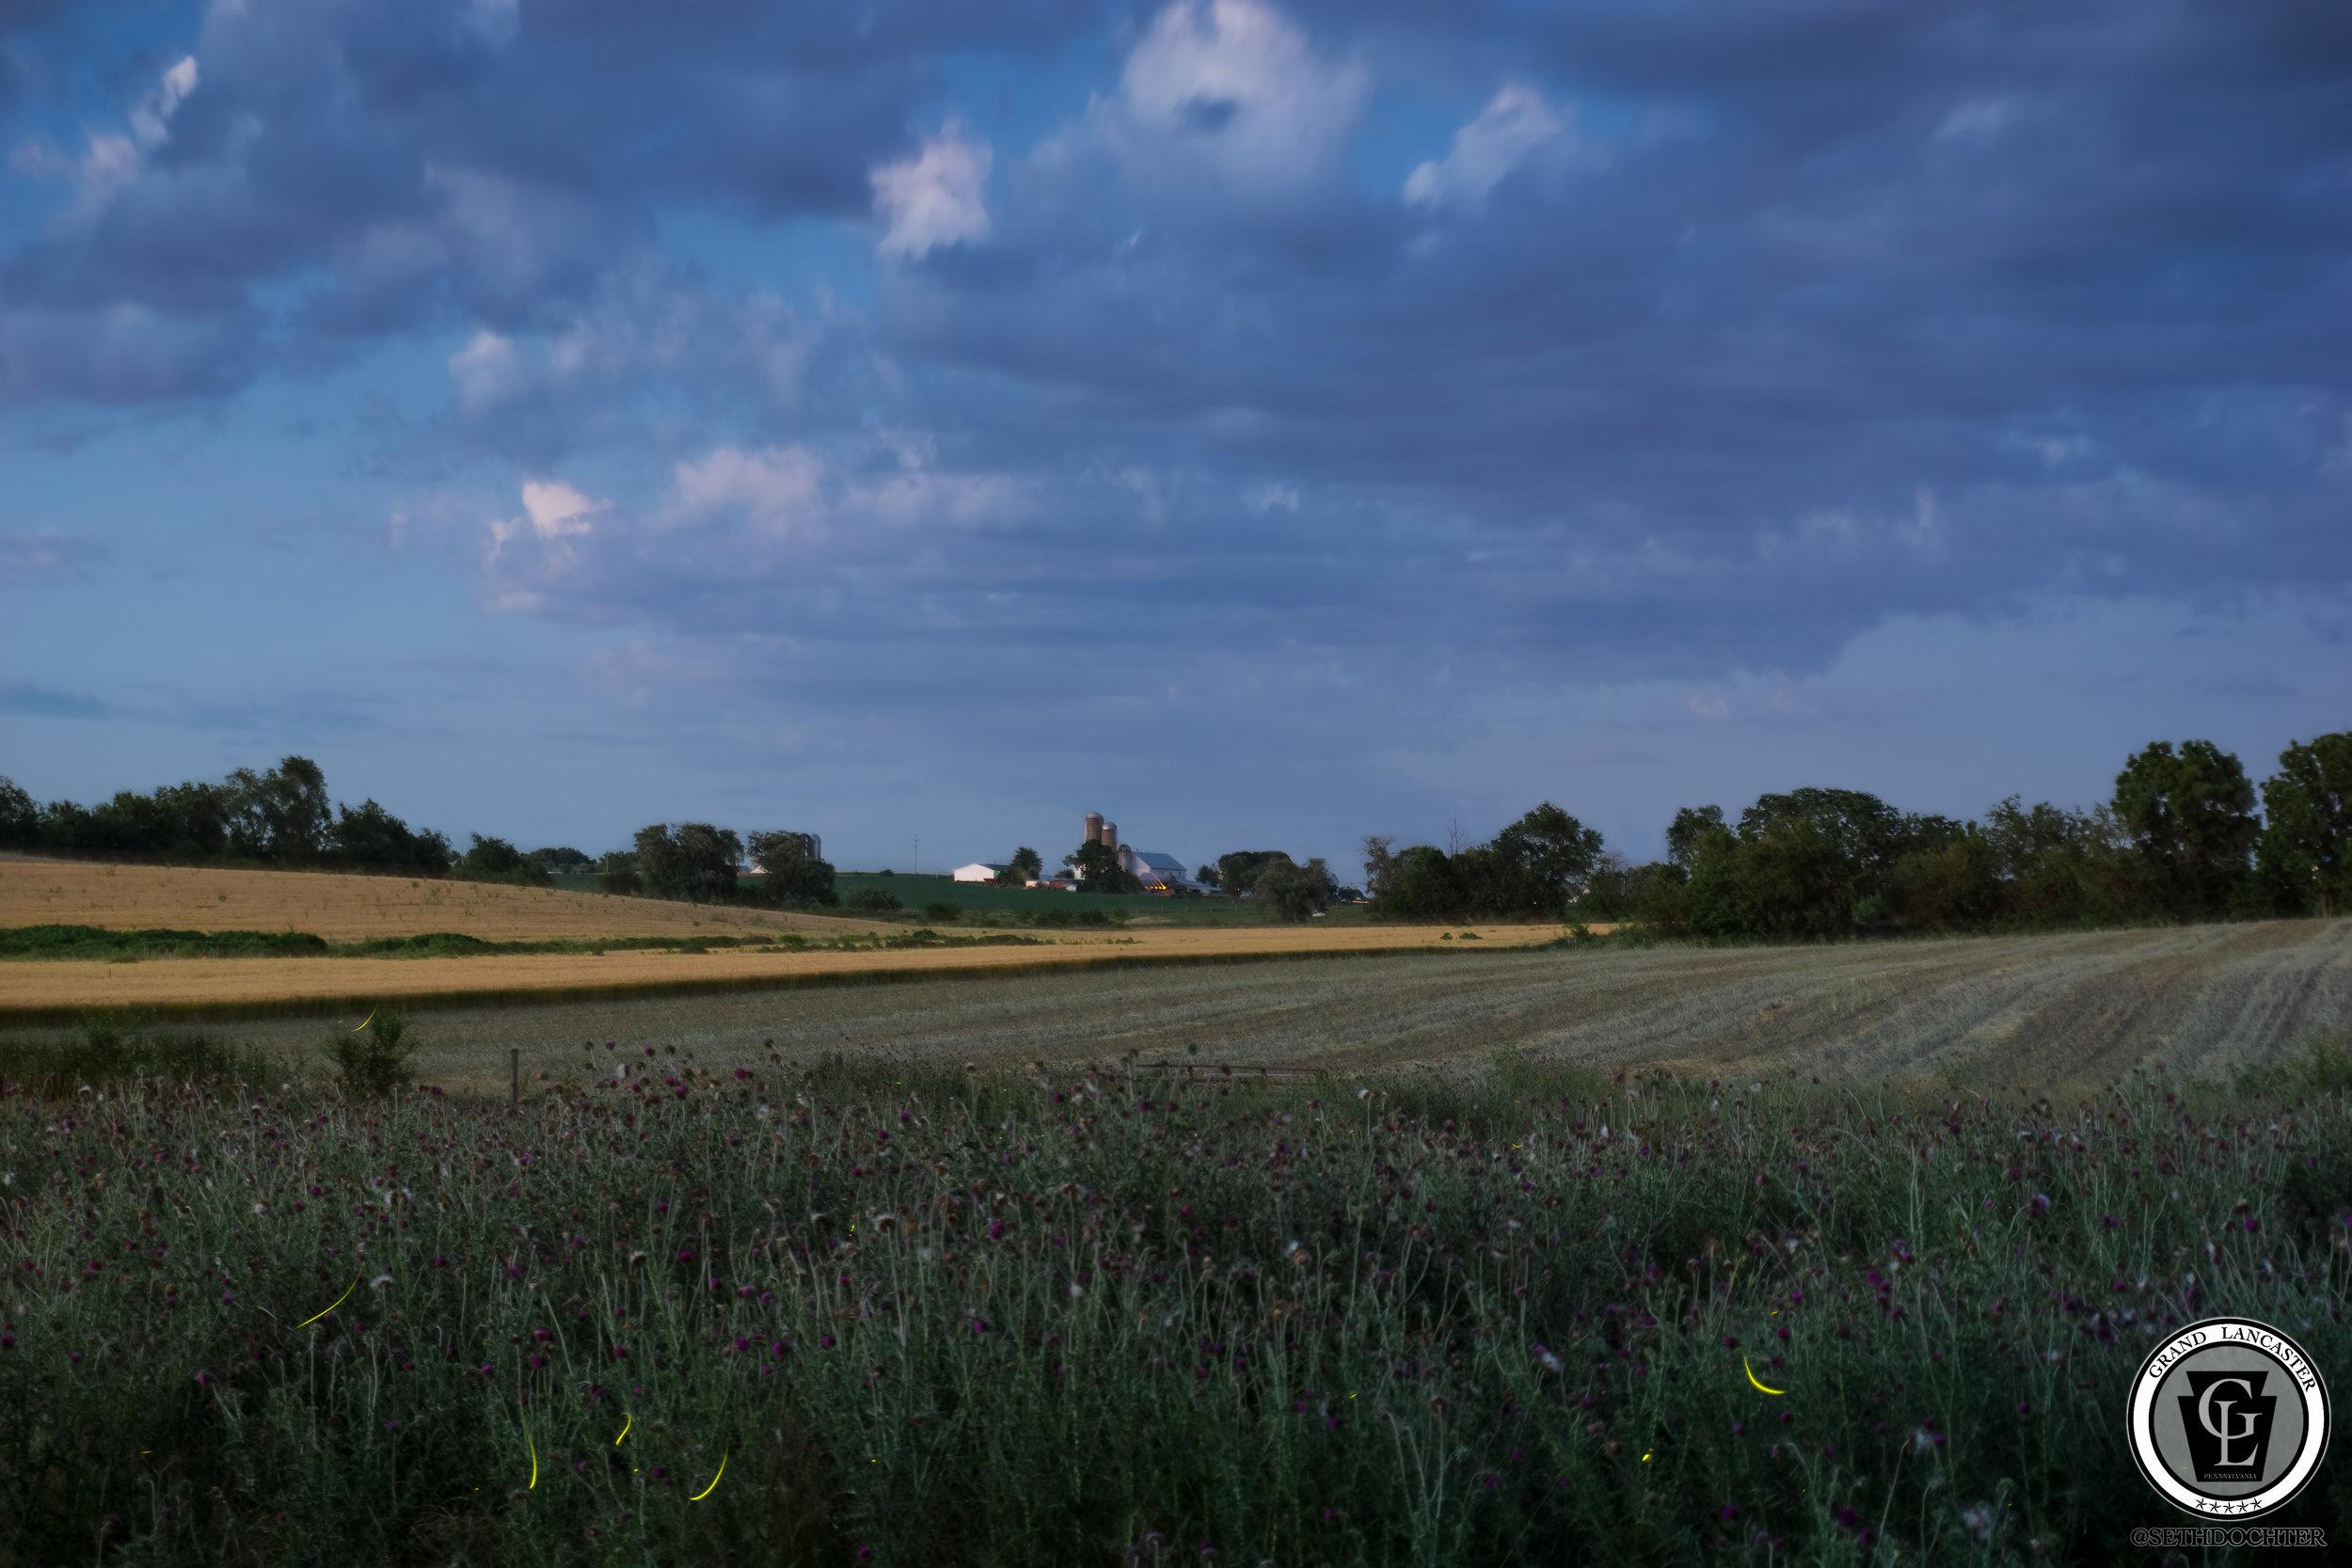 1274 - Lightning Bugs - Dusk Landscape